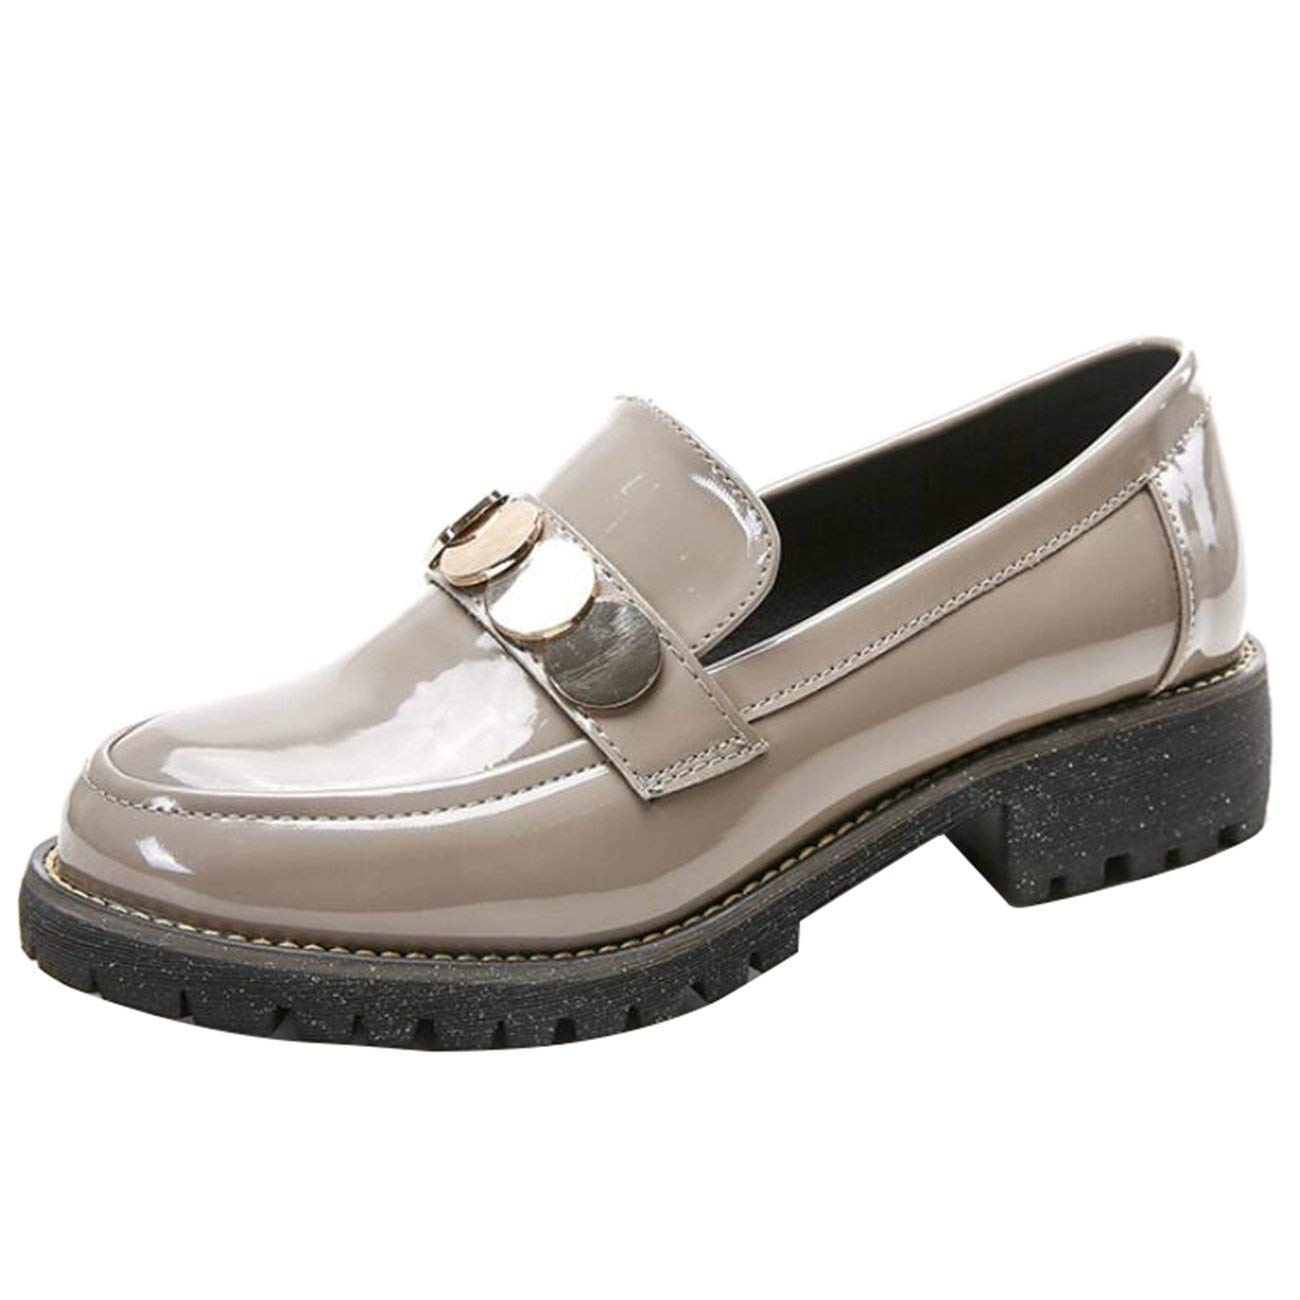 Fuxitoggo Damen Runde Toe Block-Heel Slip-On Metall Loafers Loafers Loafers (Farbe   Aprikose Größe   7 UK) ee8303